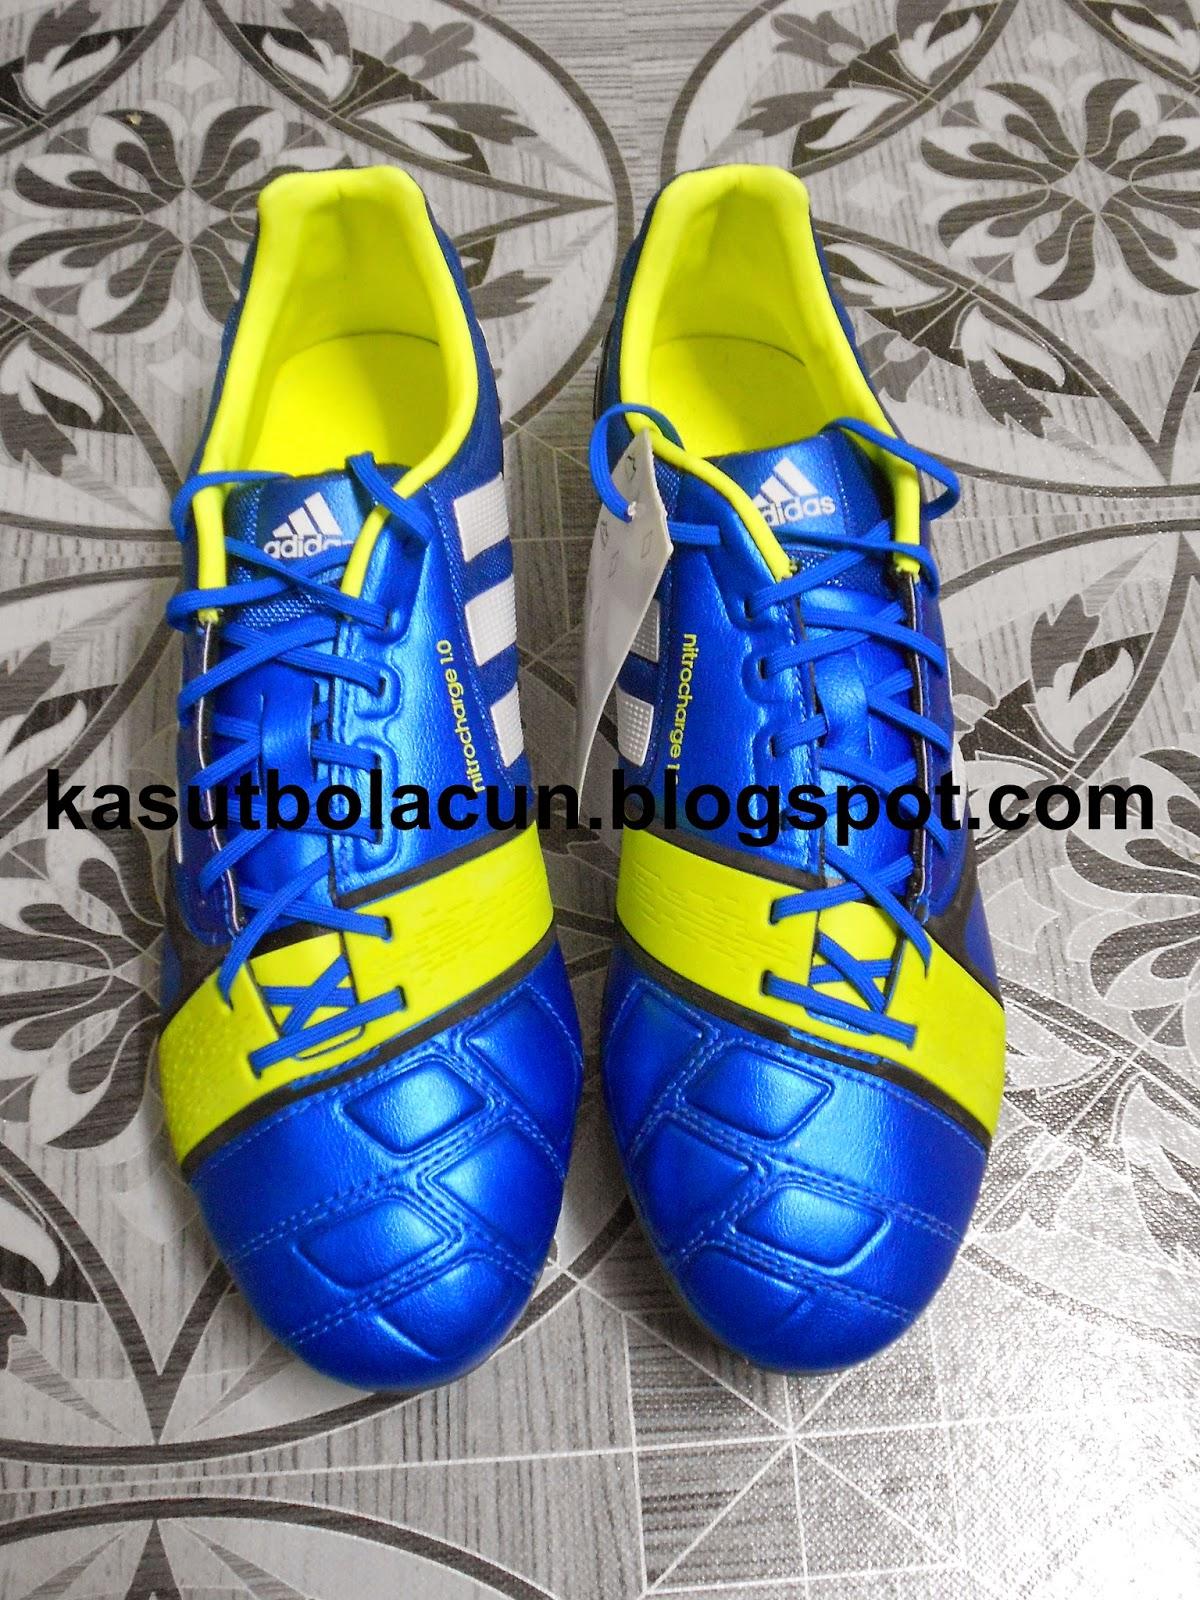 http://kasutbolacun.blogspot.com/2015/03/adidas-nitrocharge-10-fg_24.html